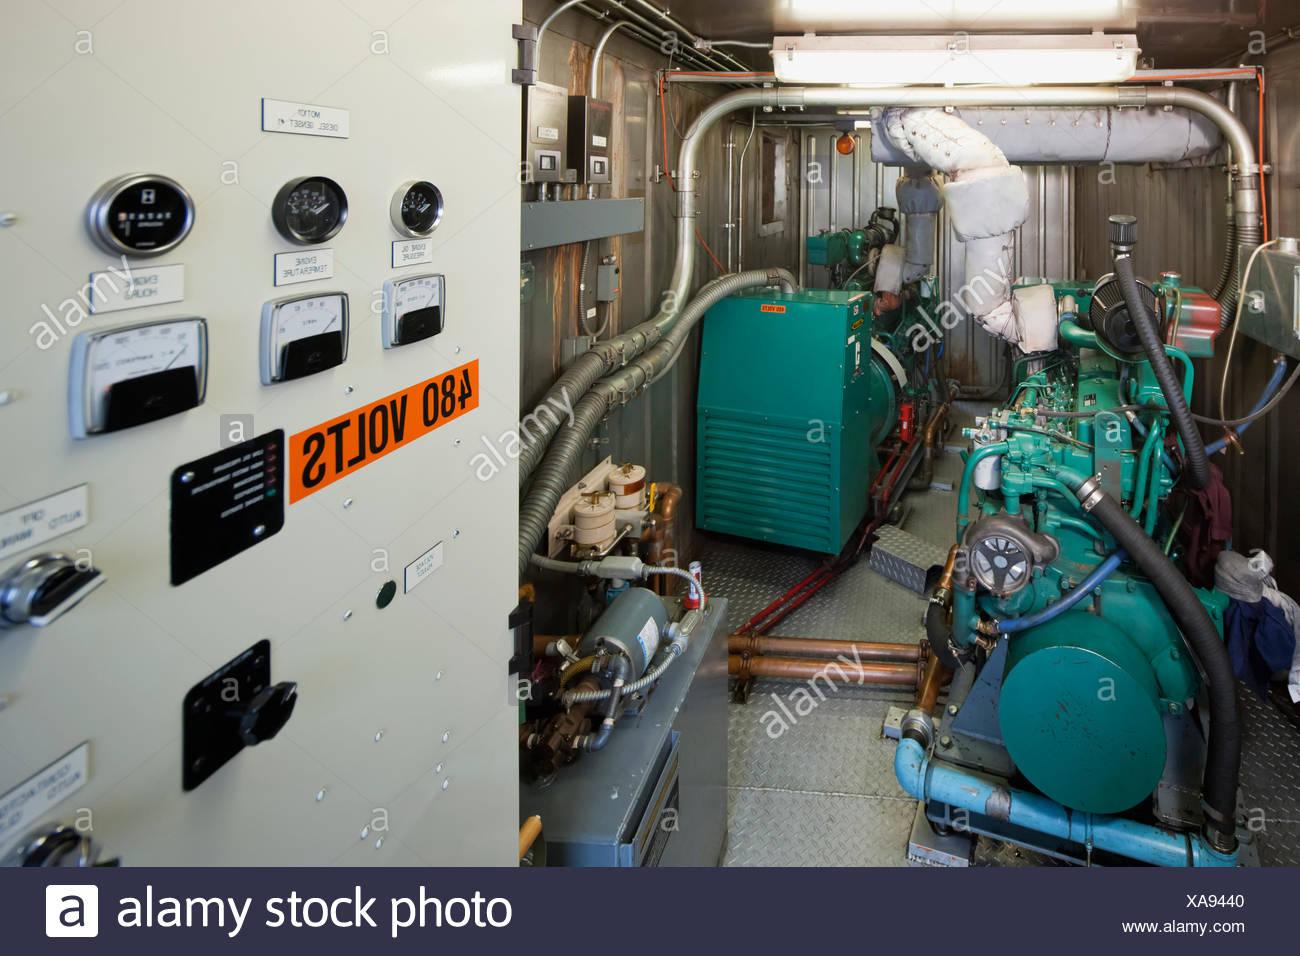 electrical power generator emergency power an indoor diesel generator and control panel electrical power plant st paul island southwestern alaska usa summer plant